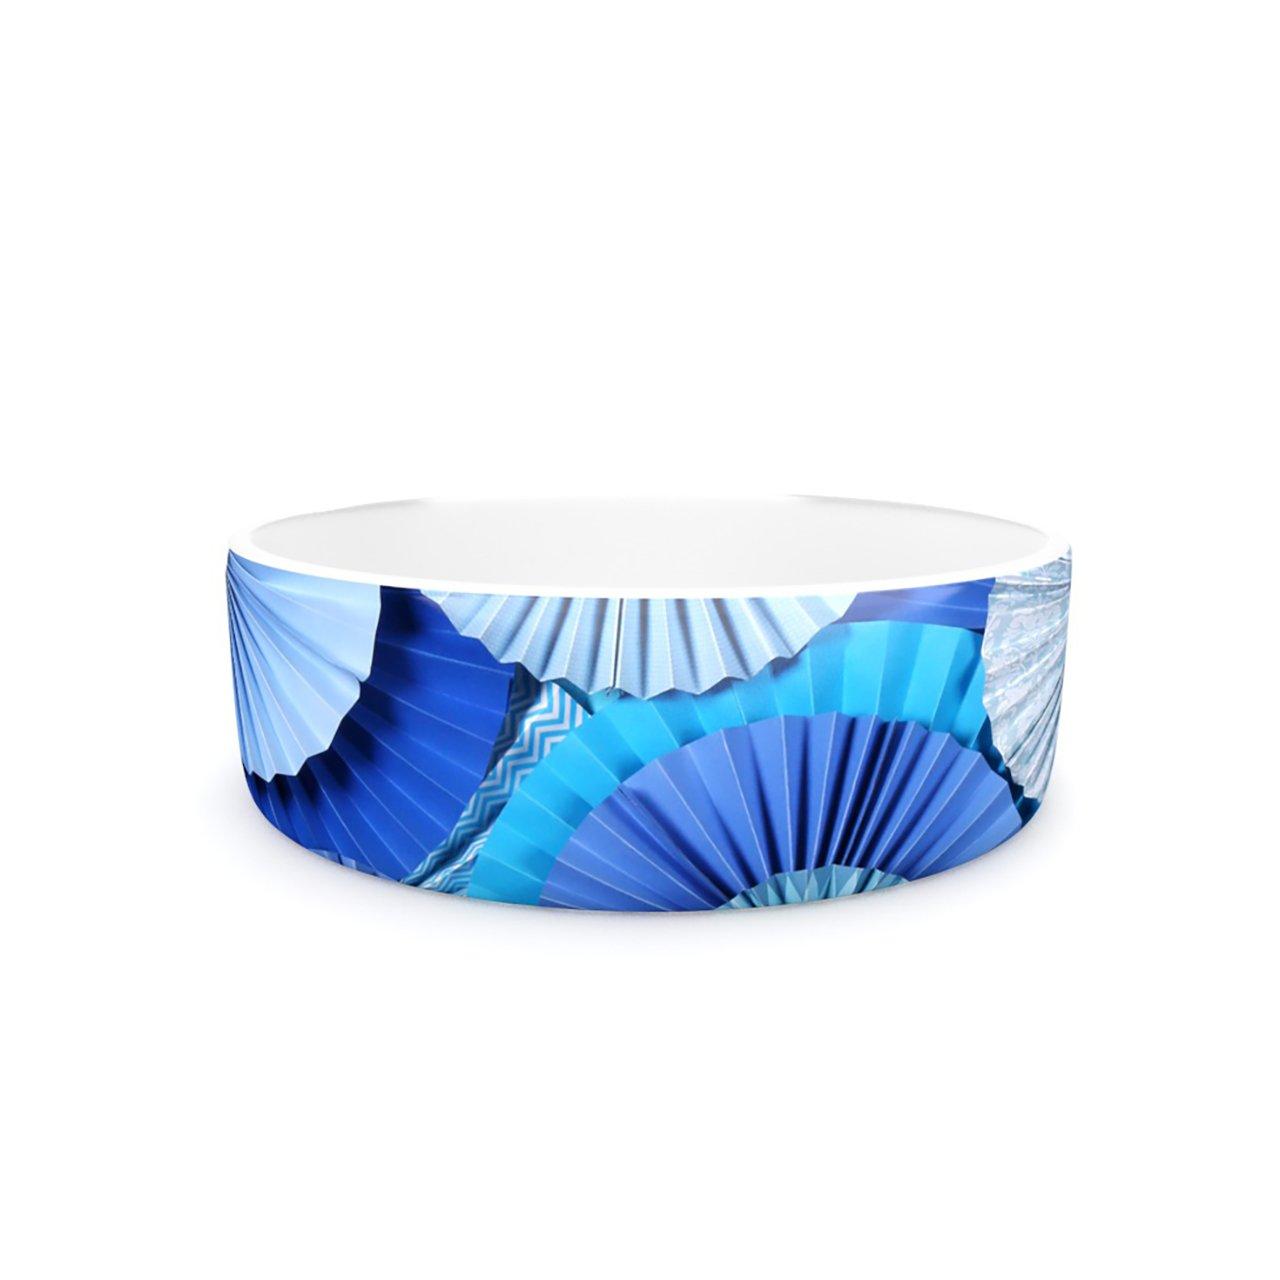 Kess InHouse Heidi Jennings bluee Lagoon  Pet Bowl, 7-Inch, Aqua Navy